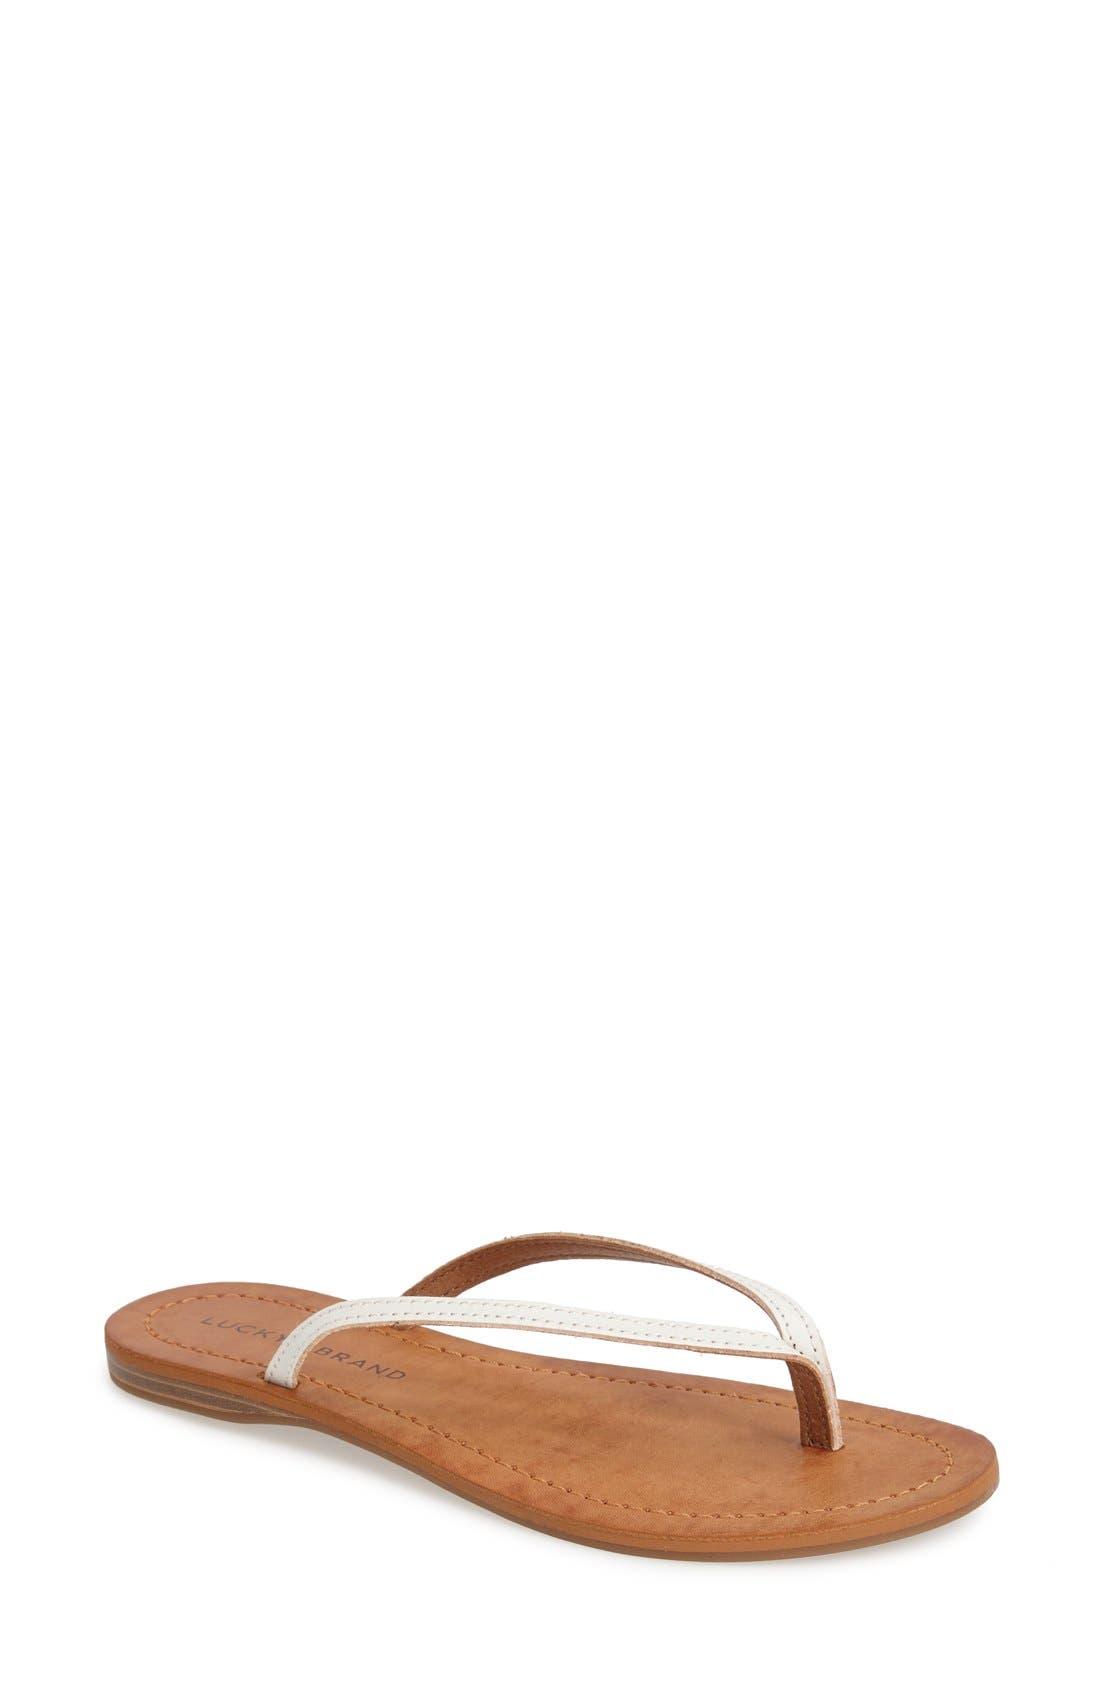 Alternate Image 1 Selected - Lucky Brand 'Amberr' Leather Thong Sandal (Women)